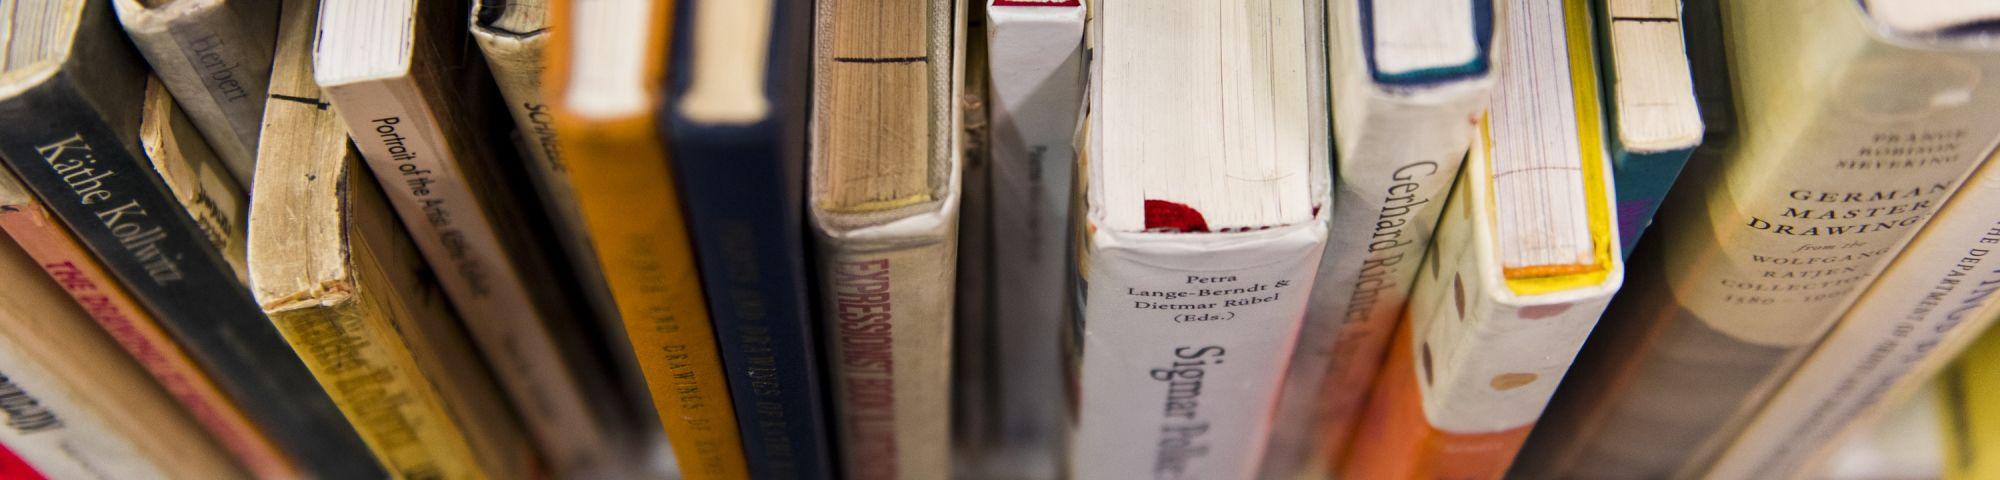 Overhead photo of a shelf of books